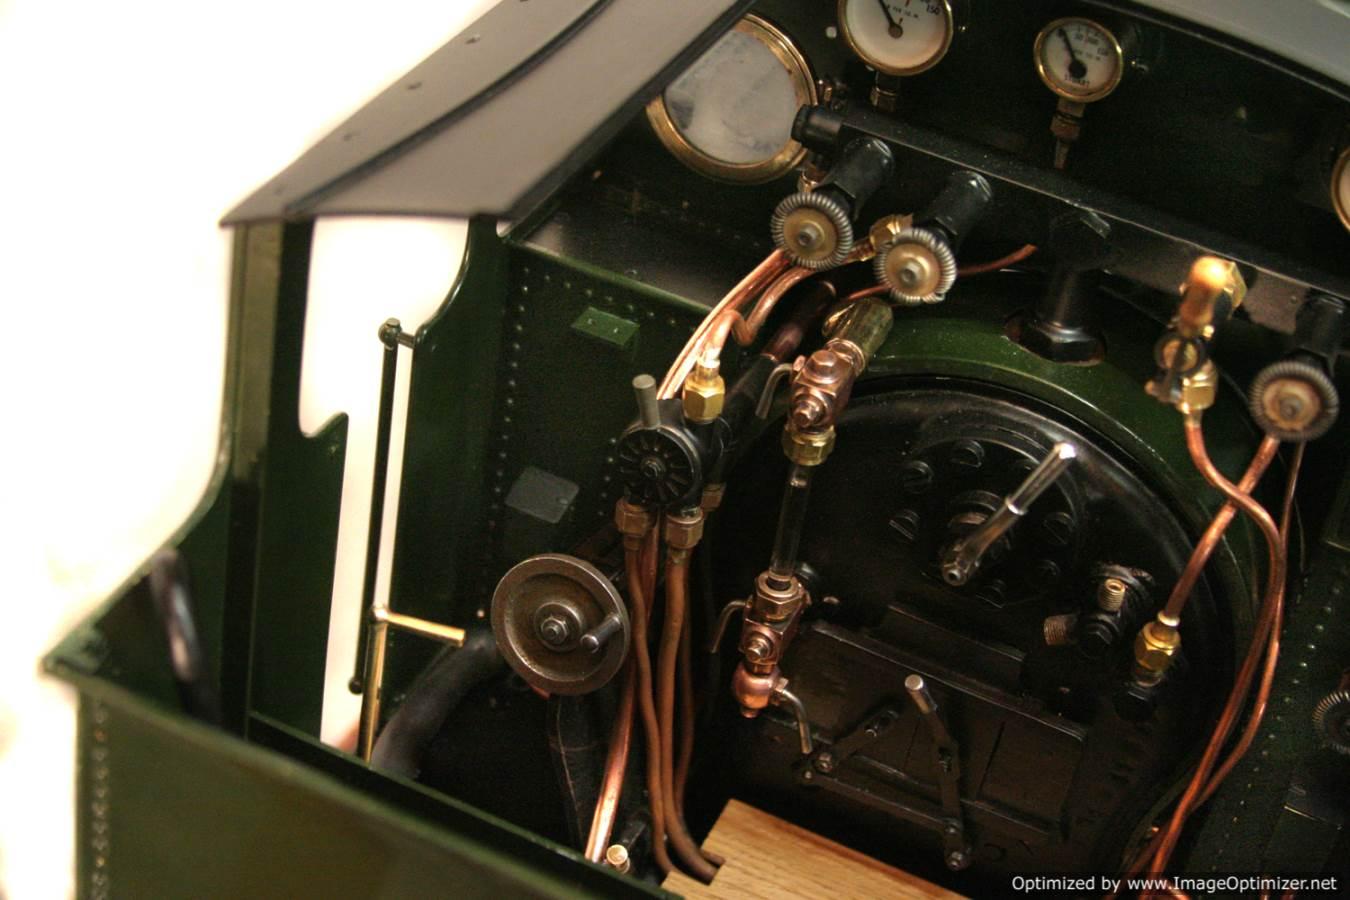 test simplex live steam locomotive for sale 14 Optimized